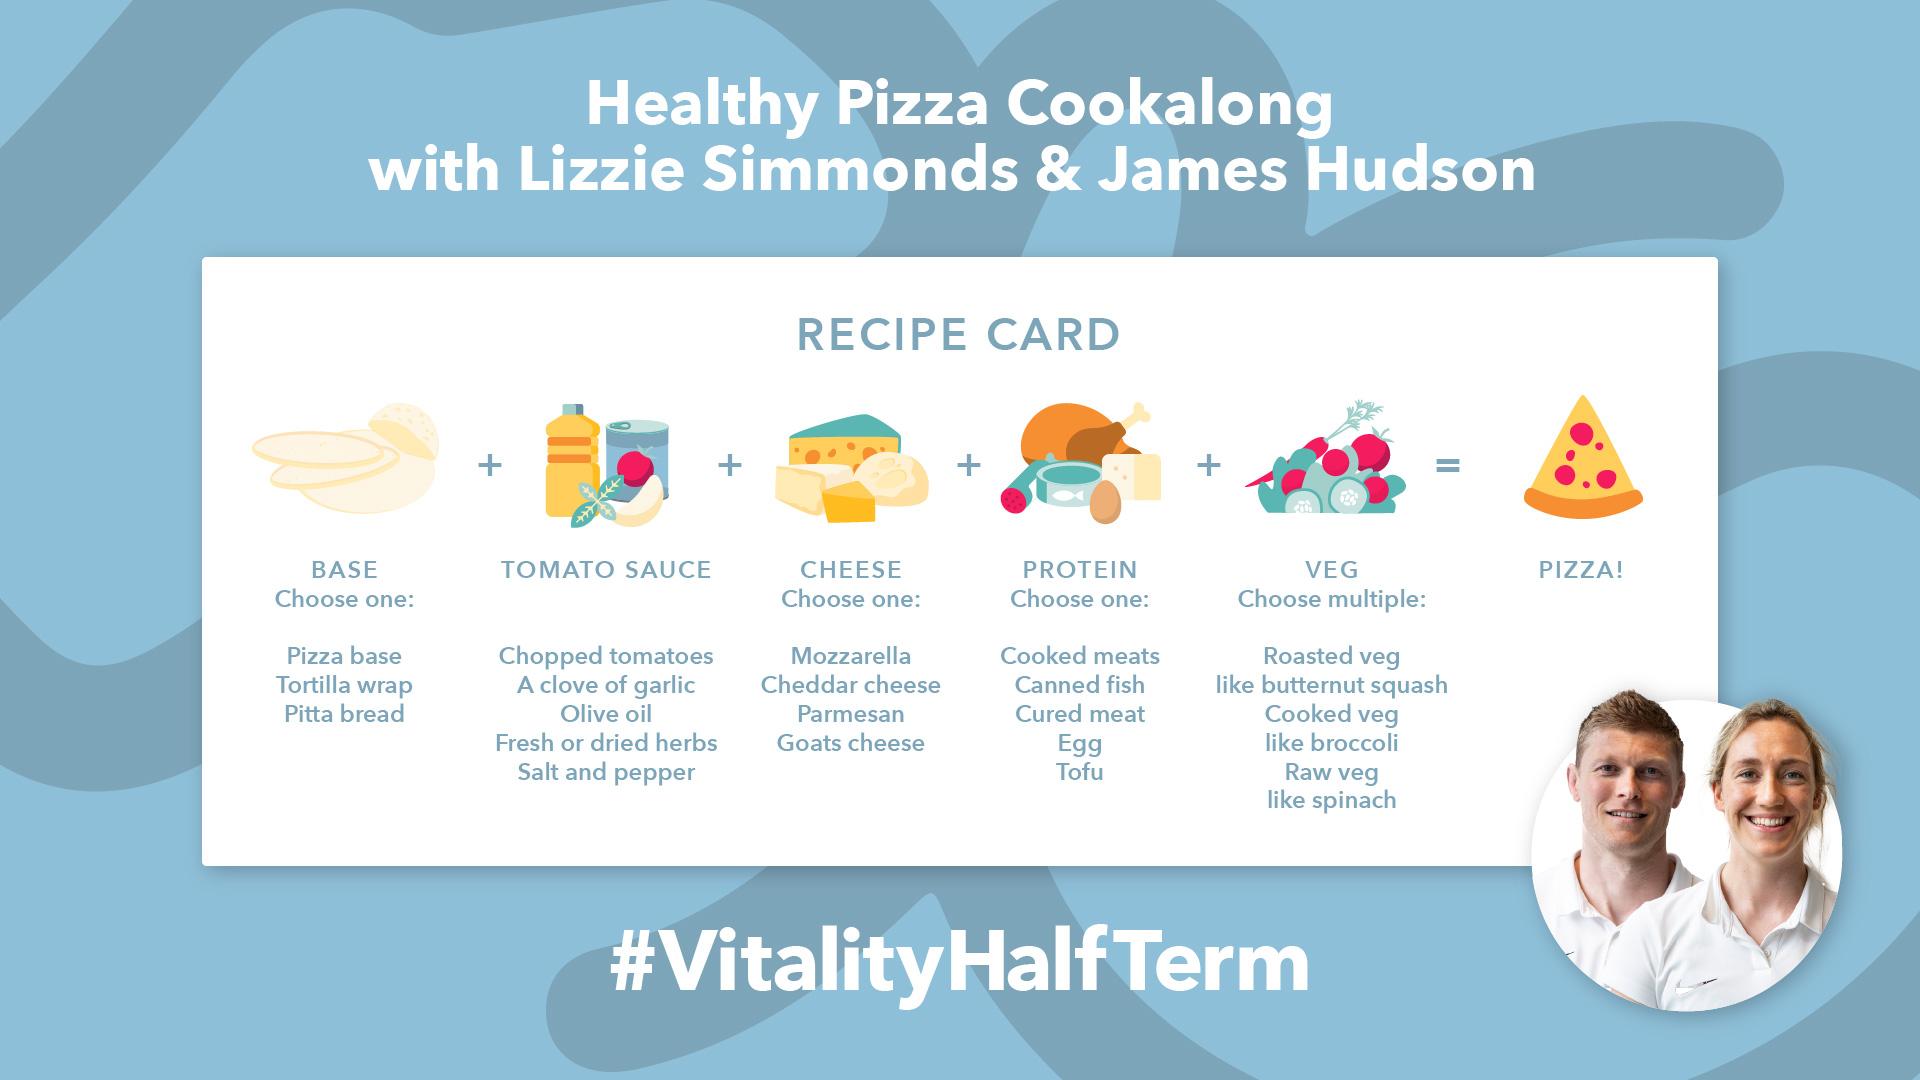 Half term pizza cookalong ingredients